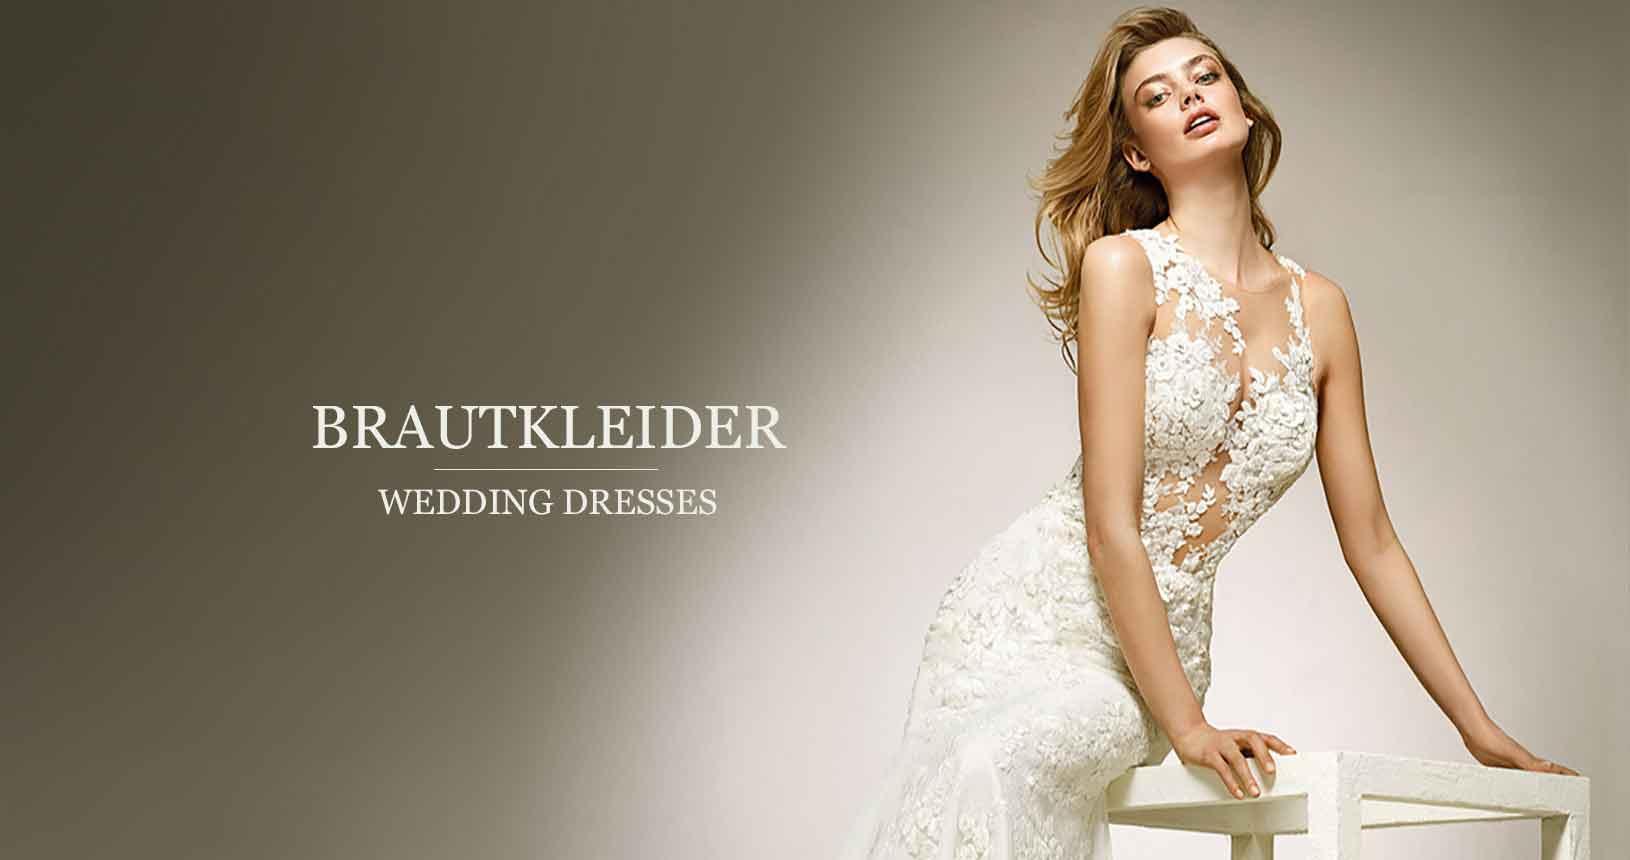 balayi-brautmoden_brautkleider-hochzeitskleider-abendkleider-herrenausstatter_hochzeitskleider